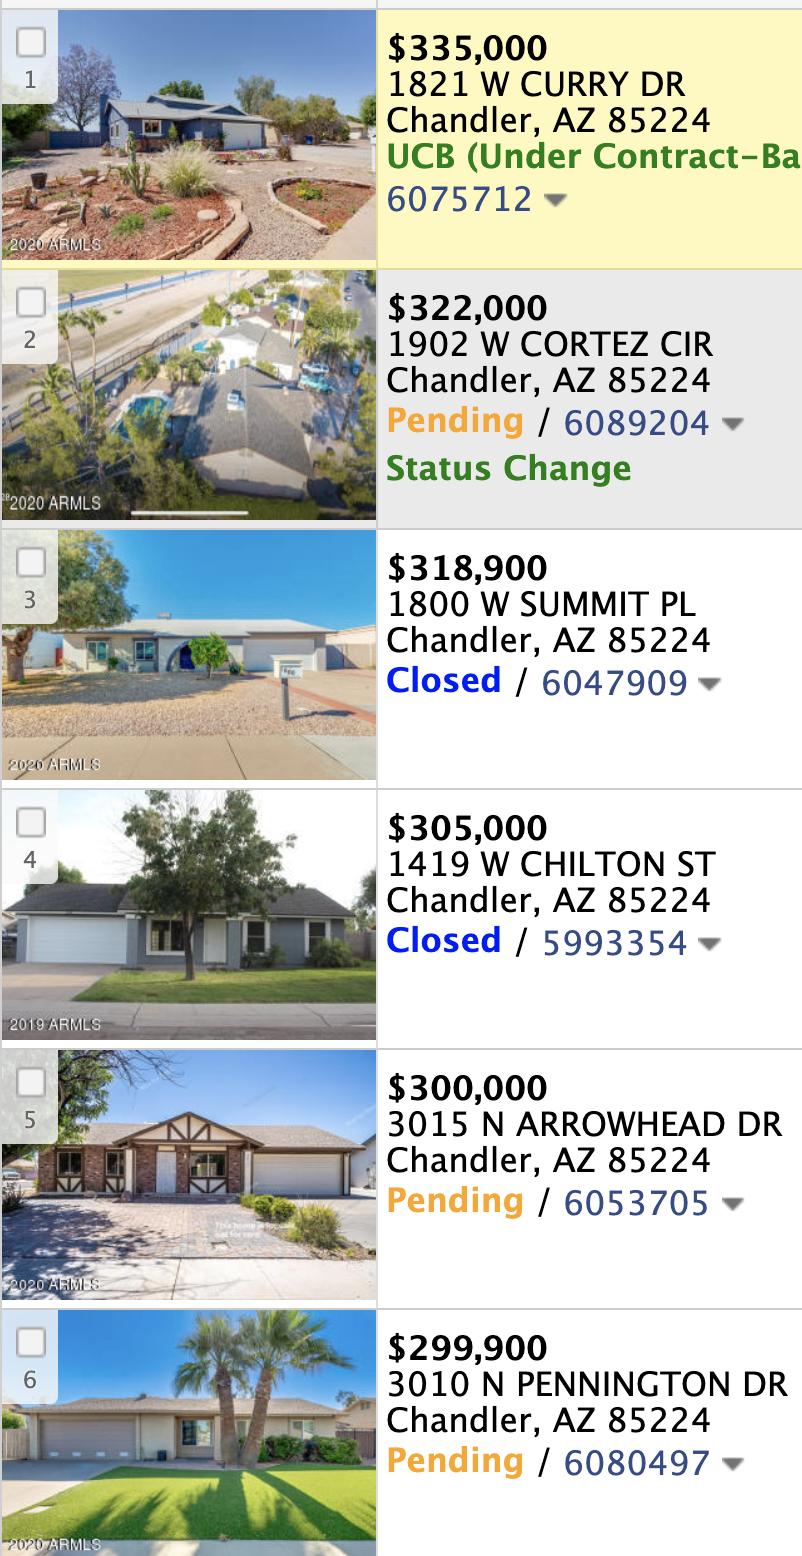 3210 N Brentwood Pl Chandler, AZ 85224 comps list